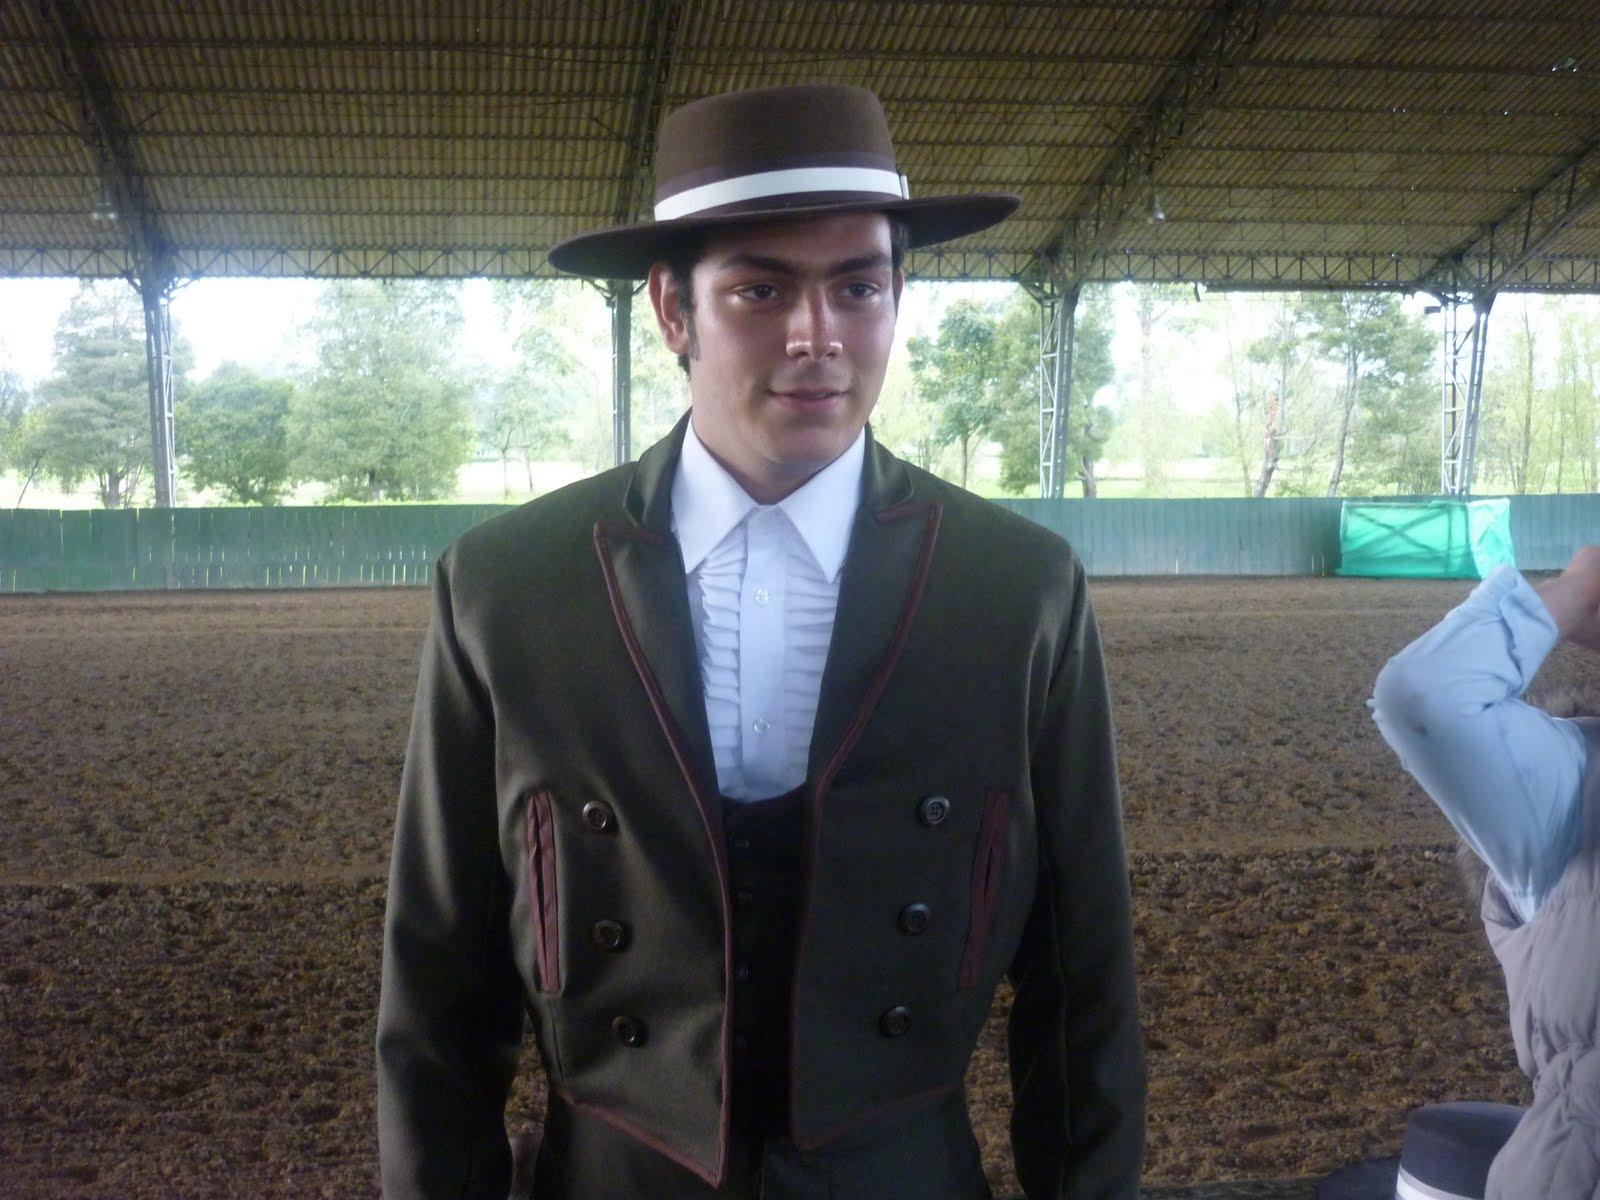 NUEVO REJONEADOR EN COLOMBIA, FELIPE VELASQUEZ OLARTE